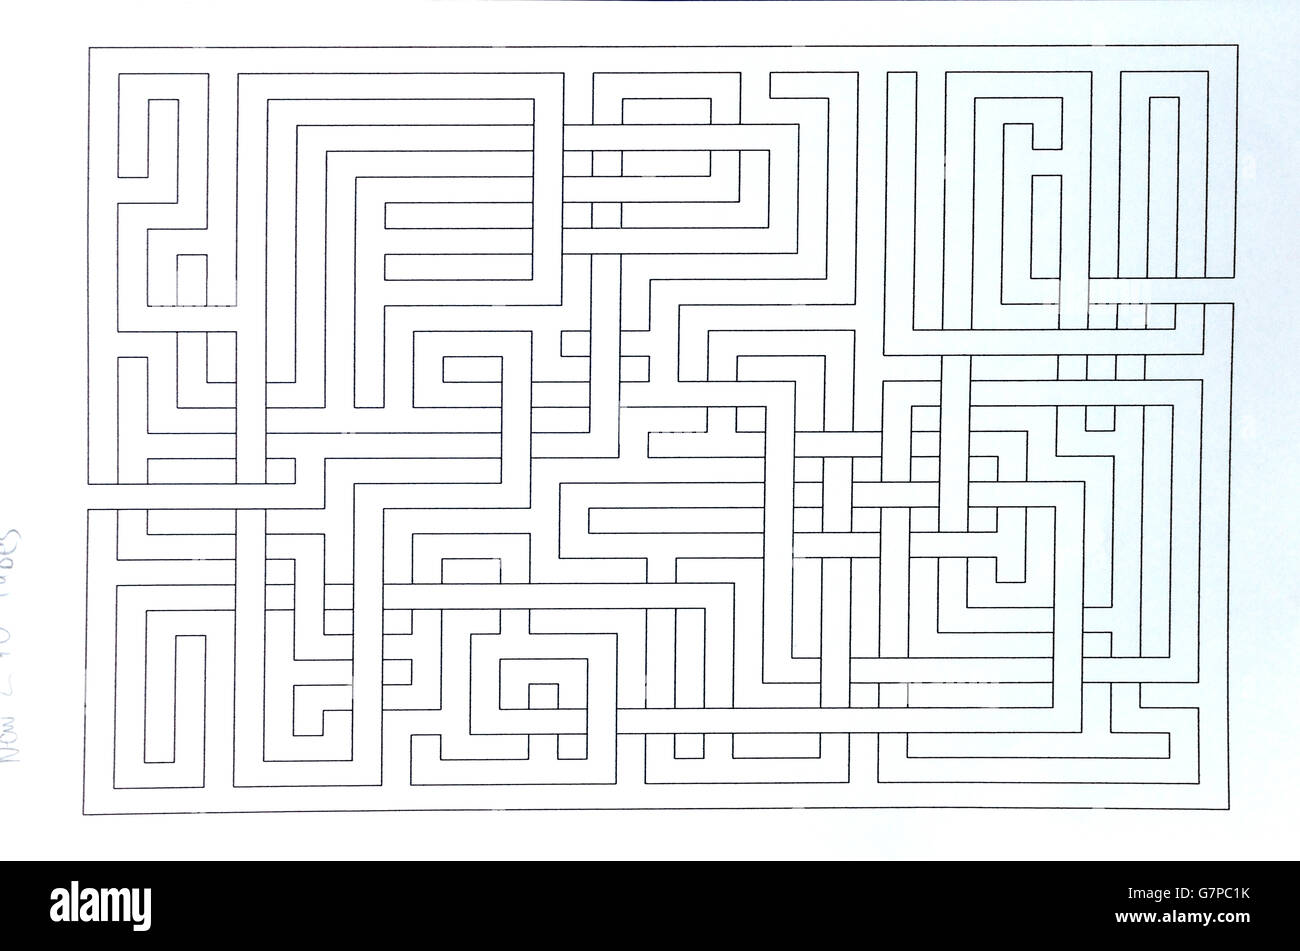 I draw, design, create, generate, make  aMAZEing labyrinths ! I love labyrinths ! - Stock Image